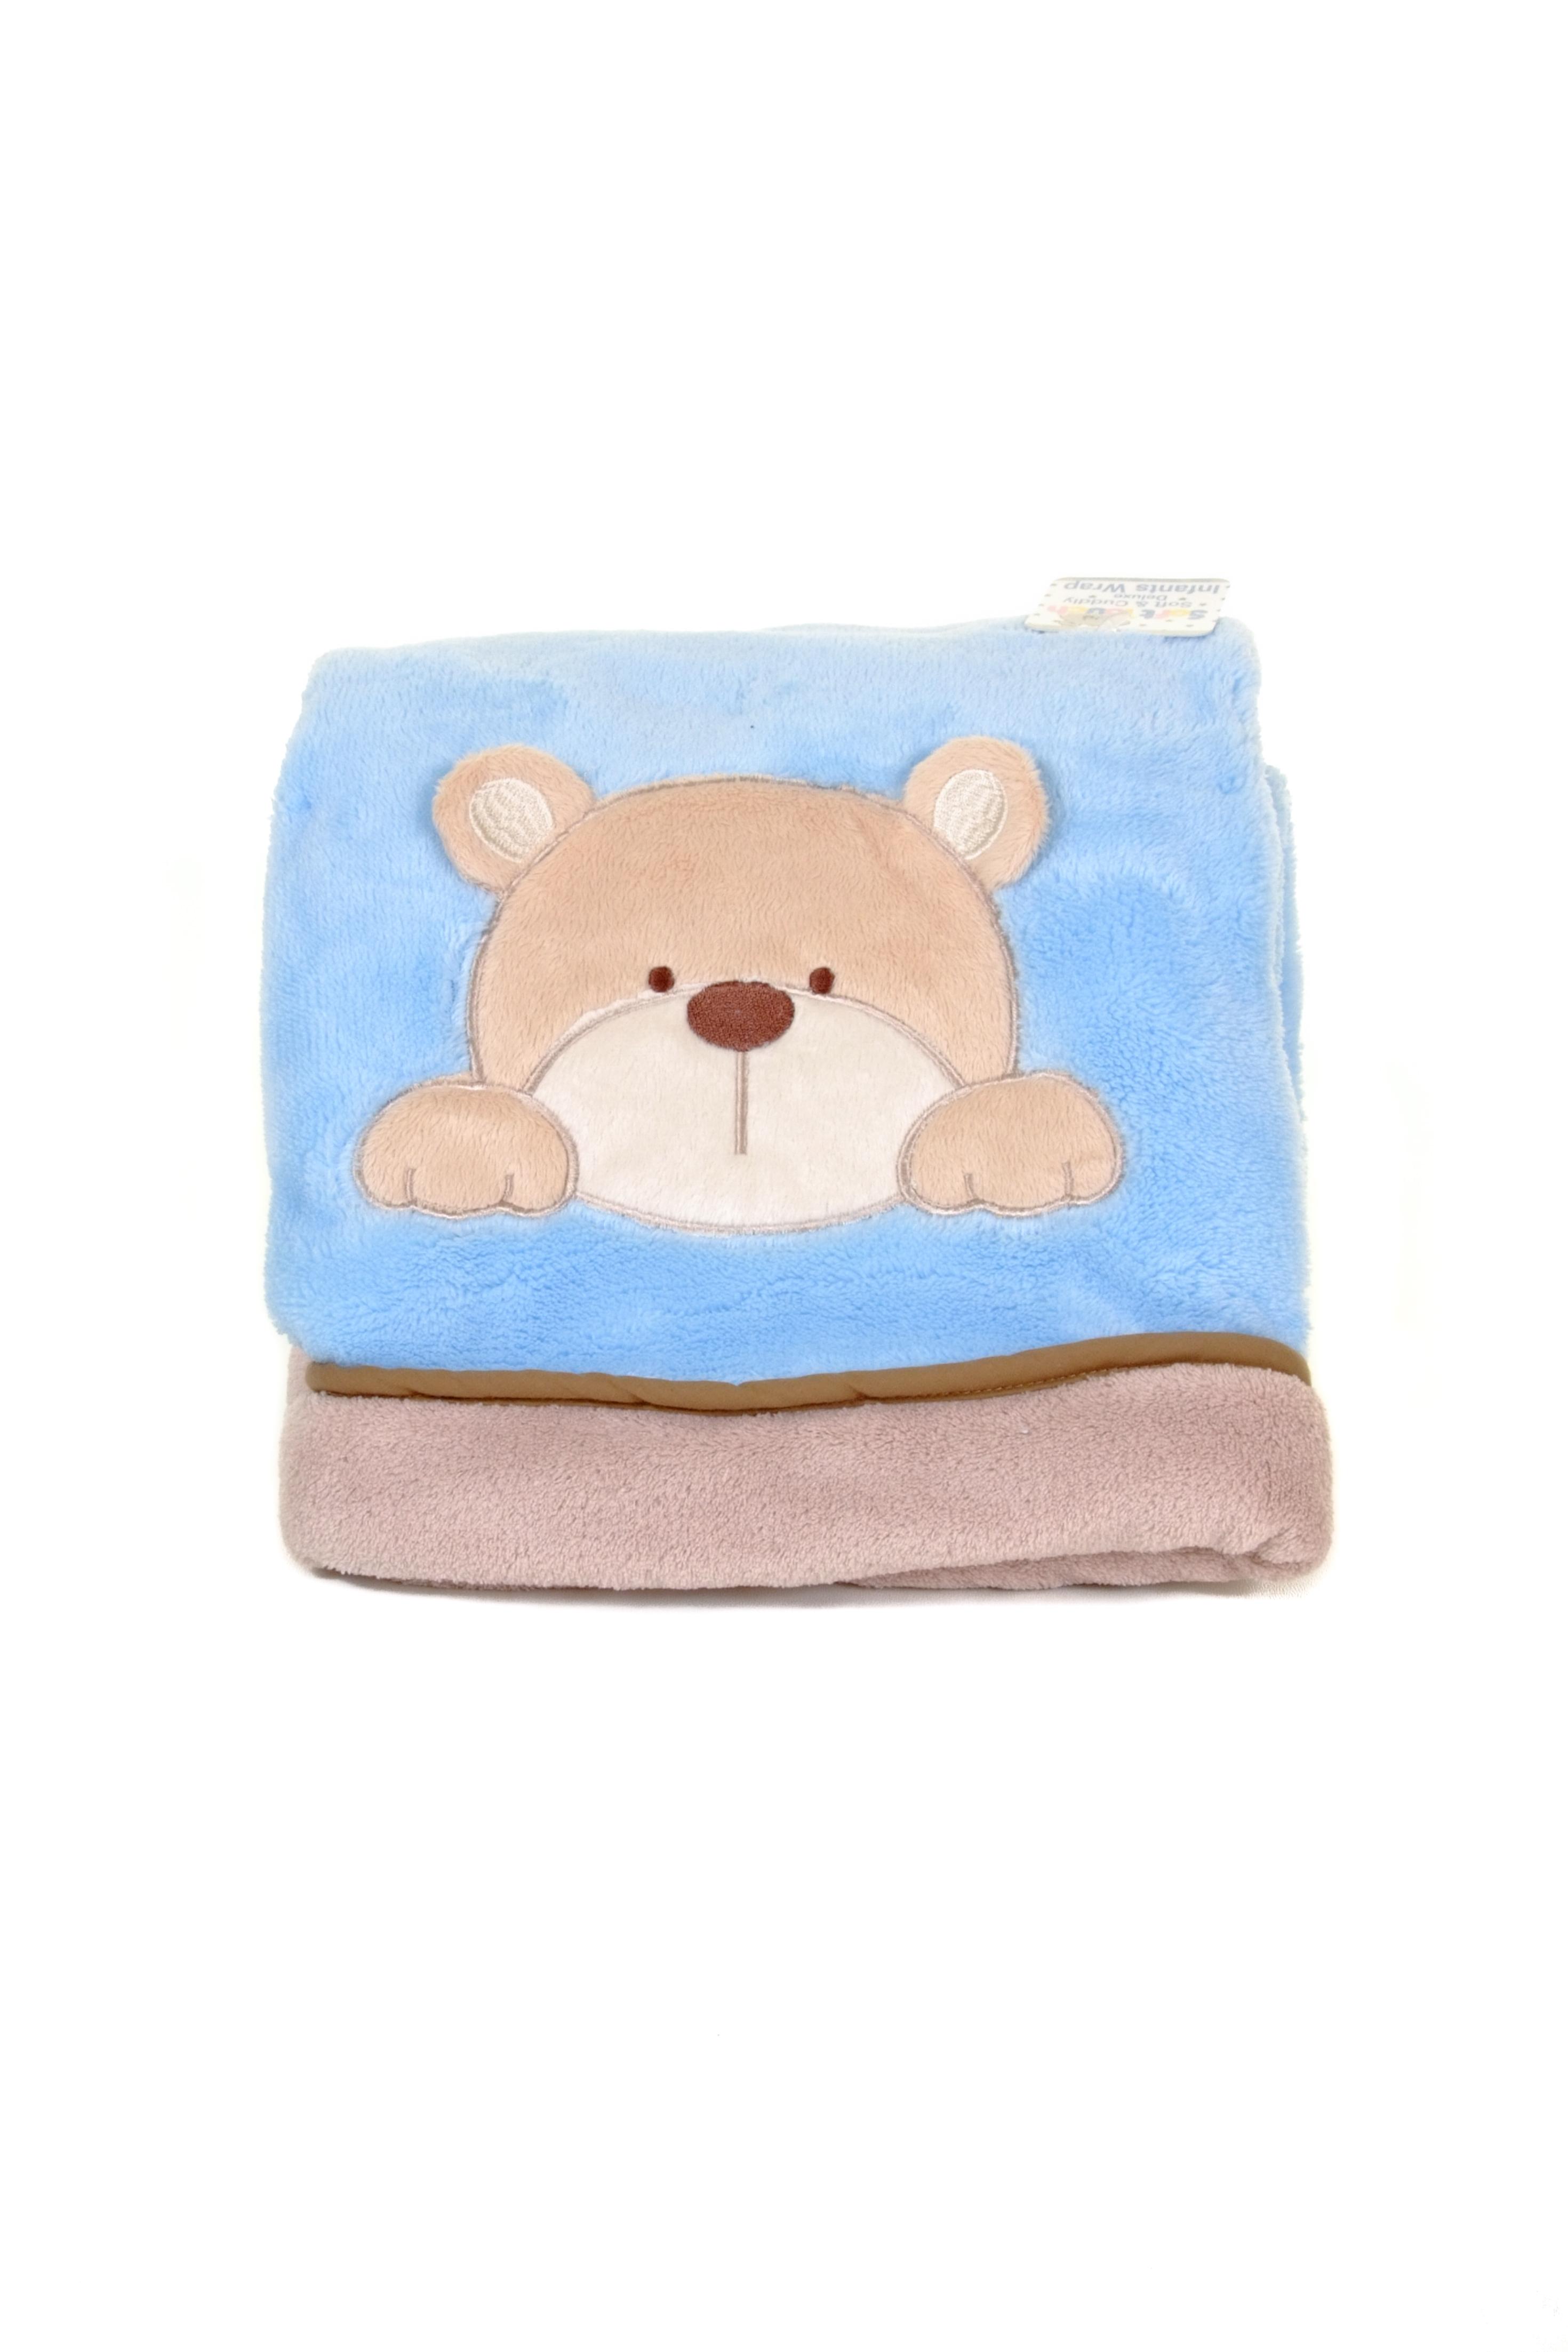 blue teddy bear crinkle baby blanket